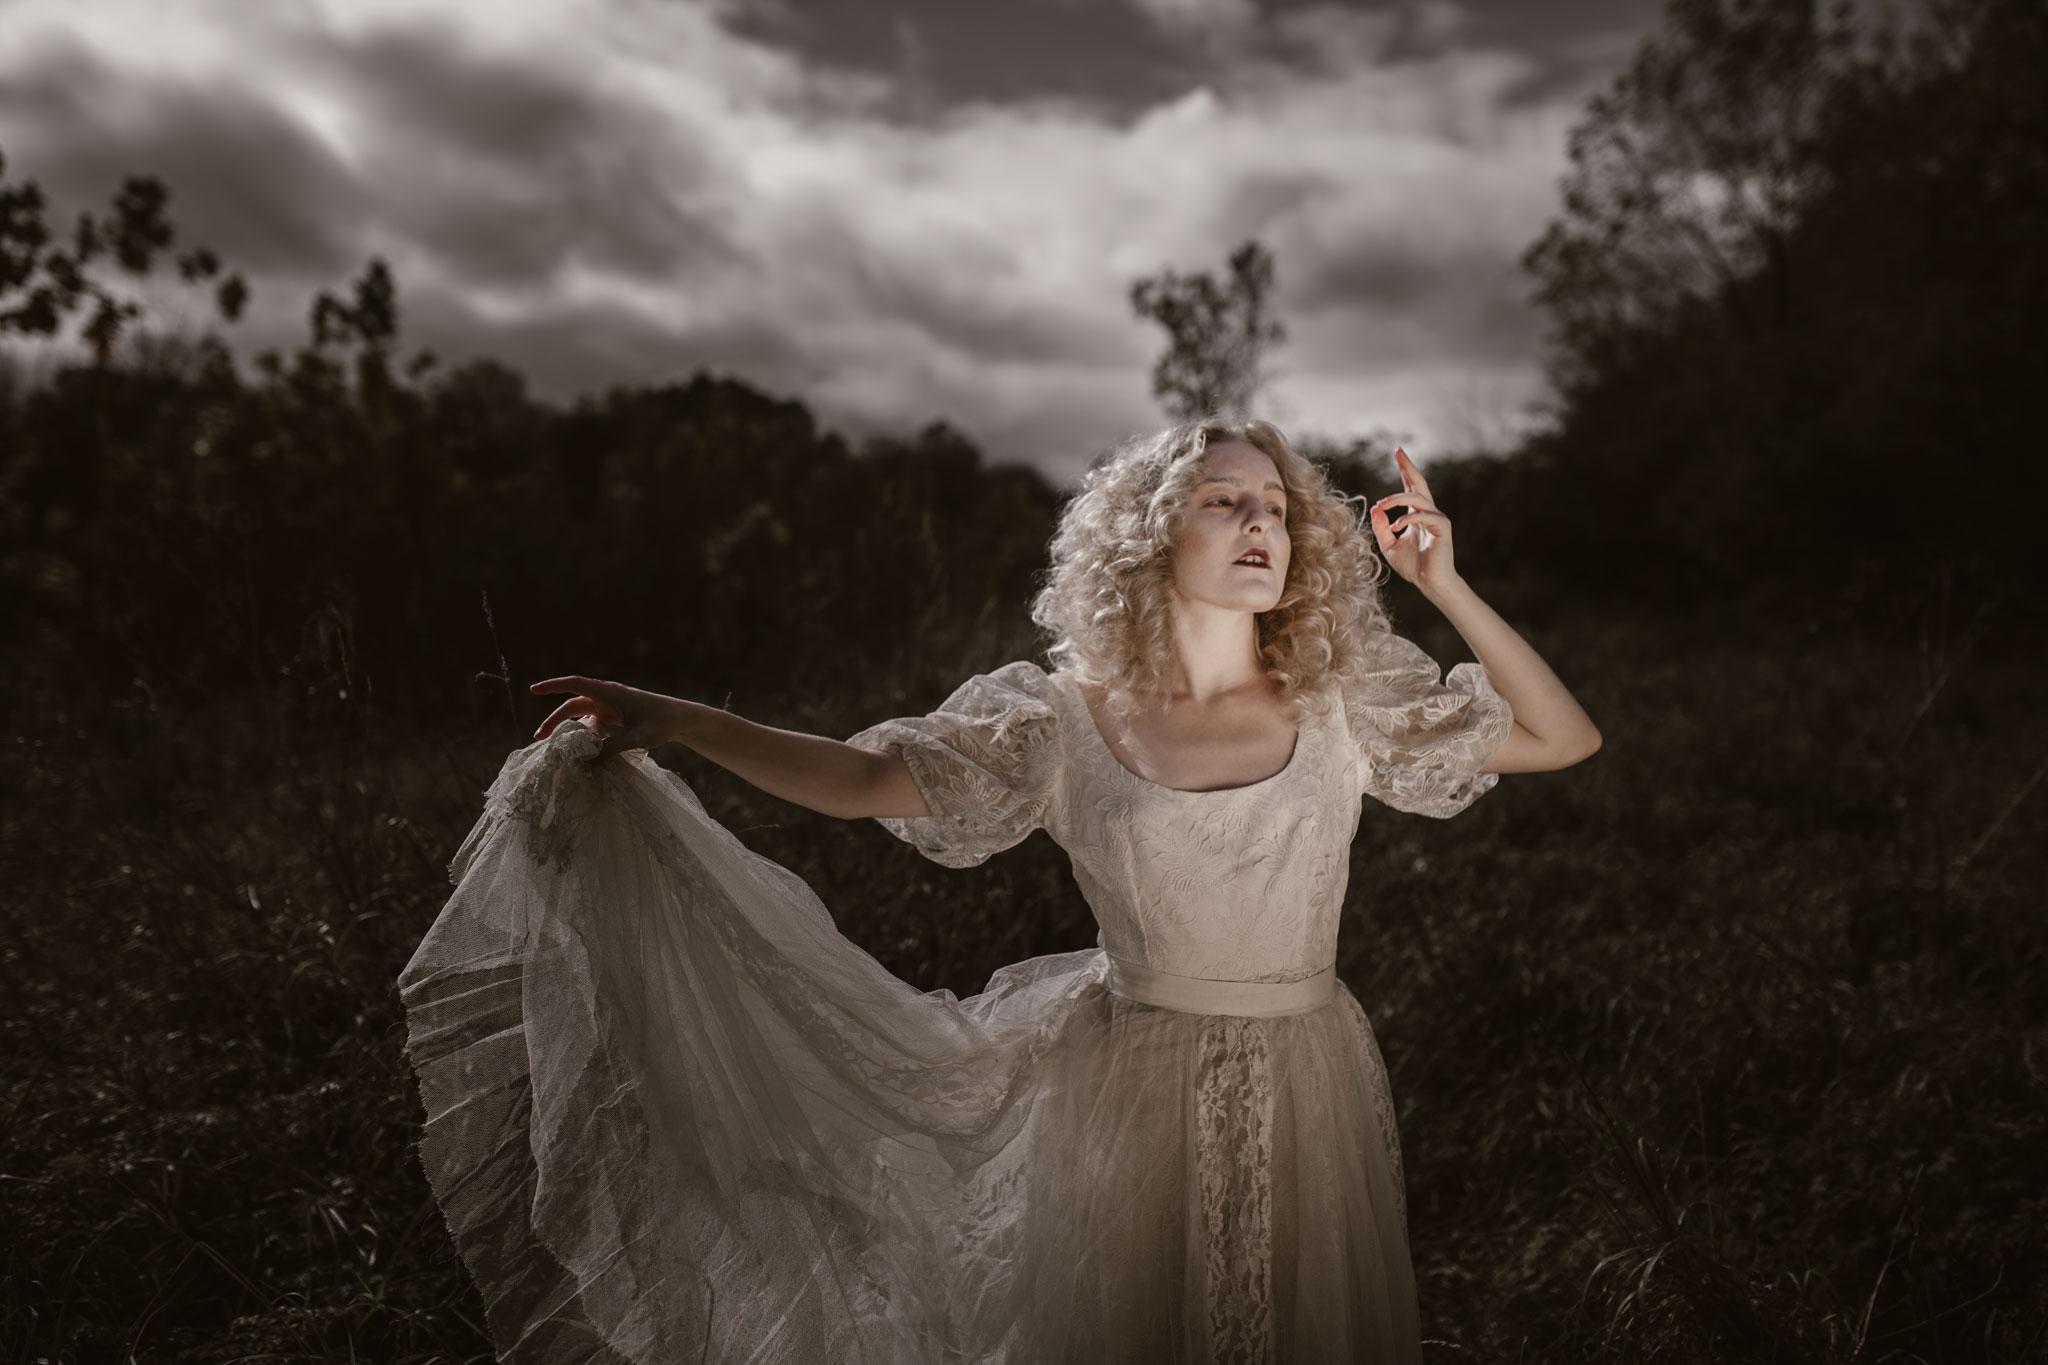 pale-witch-067fb.jpg